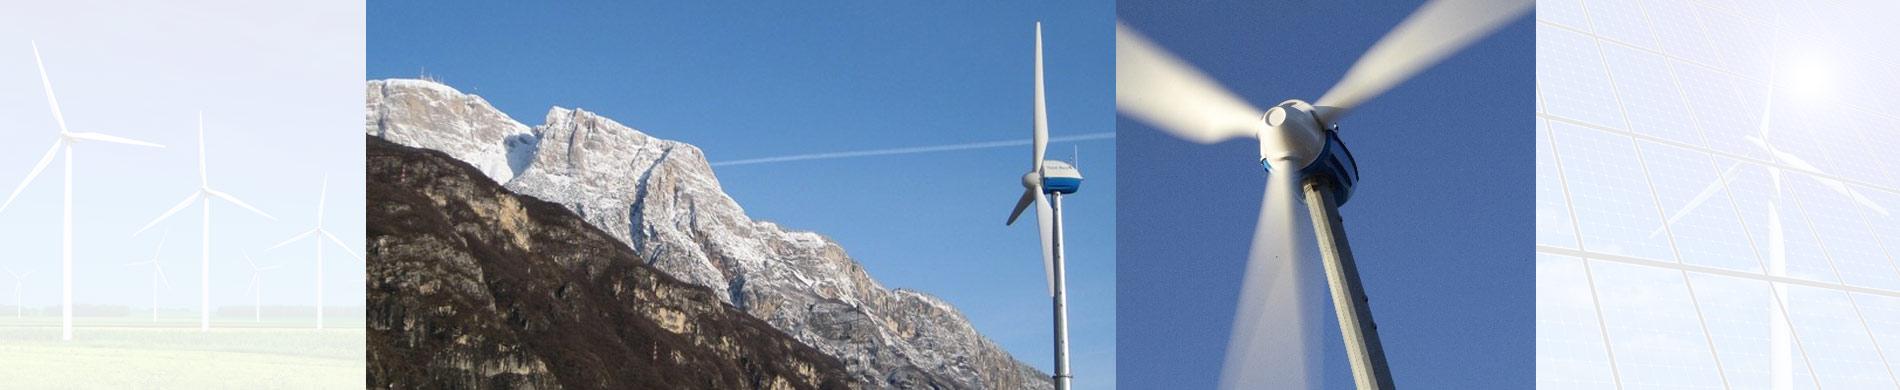 CEI NI Ltd - Wind Power